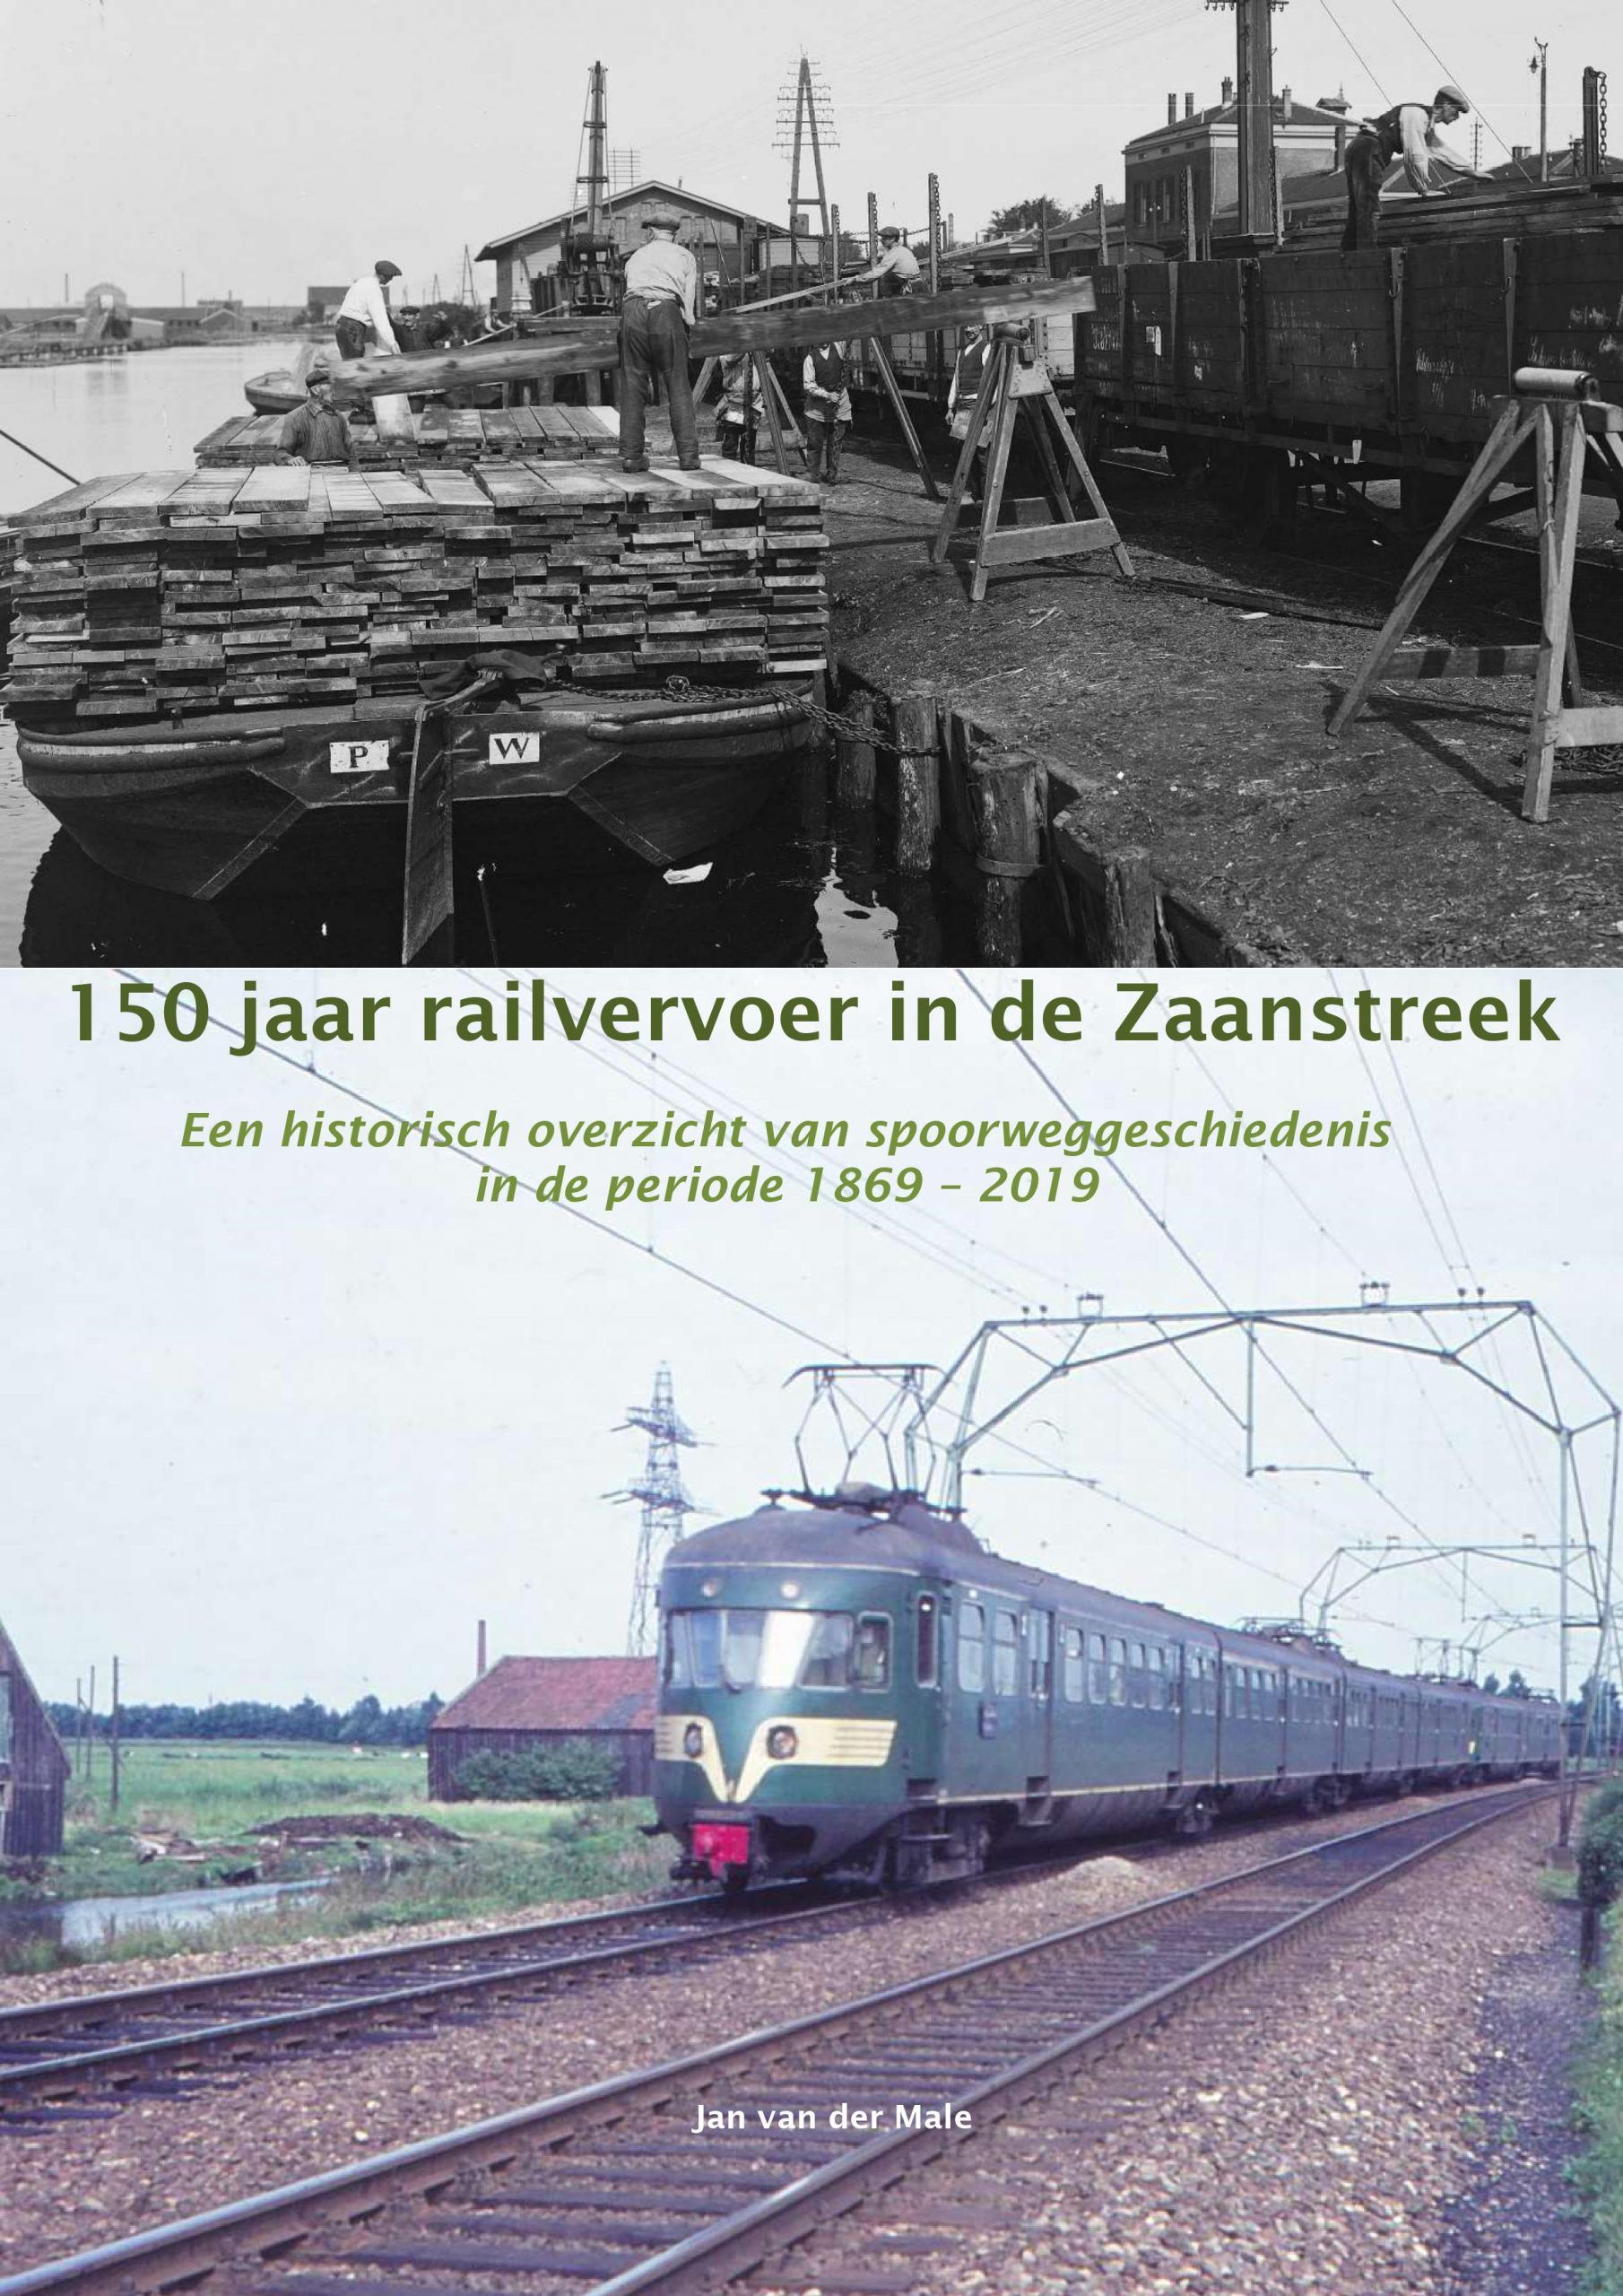 150 jaar railvervoer Zaanstreek